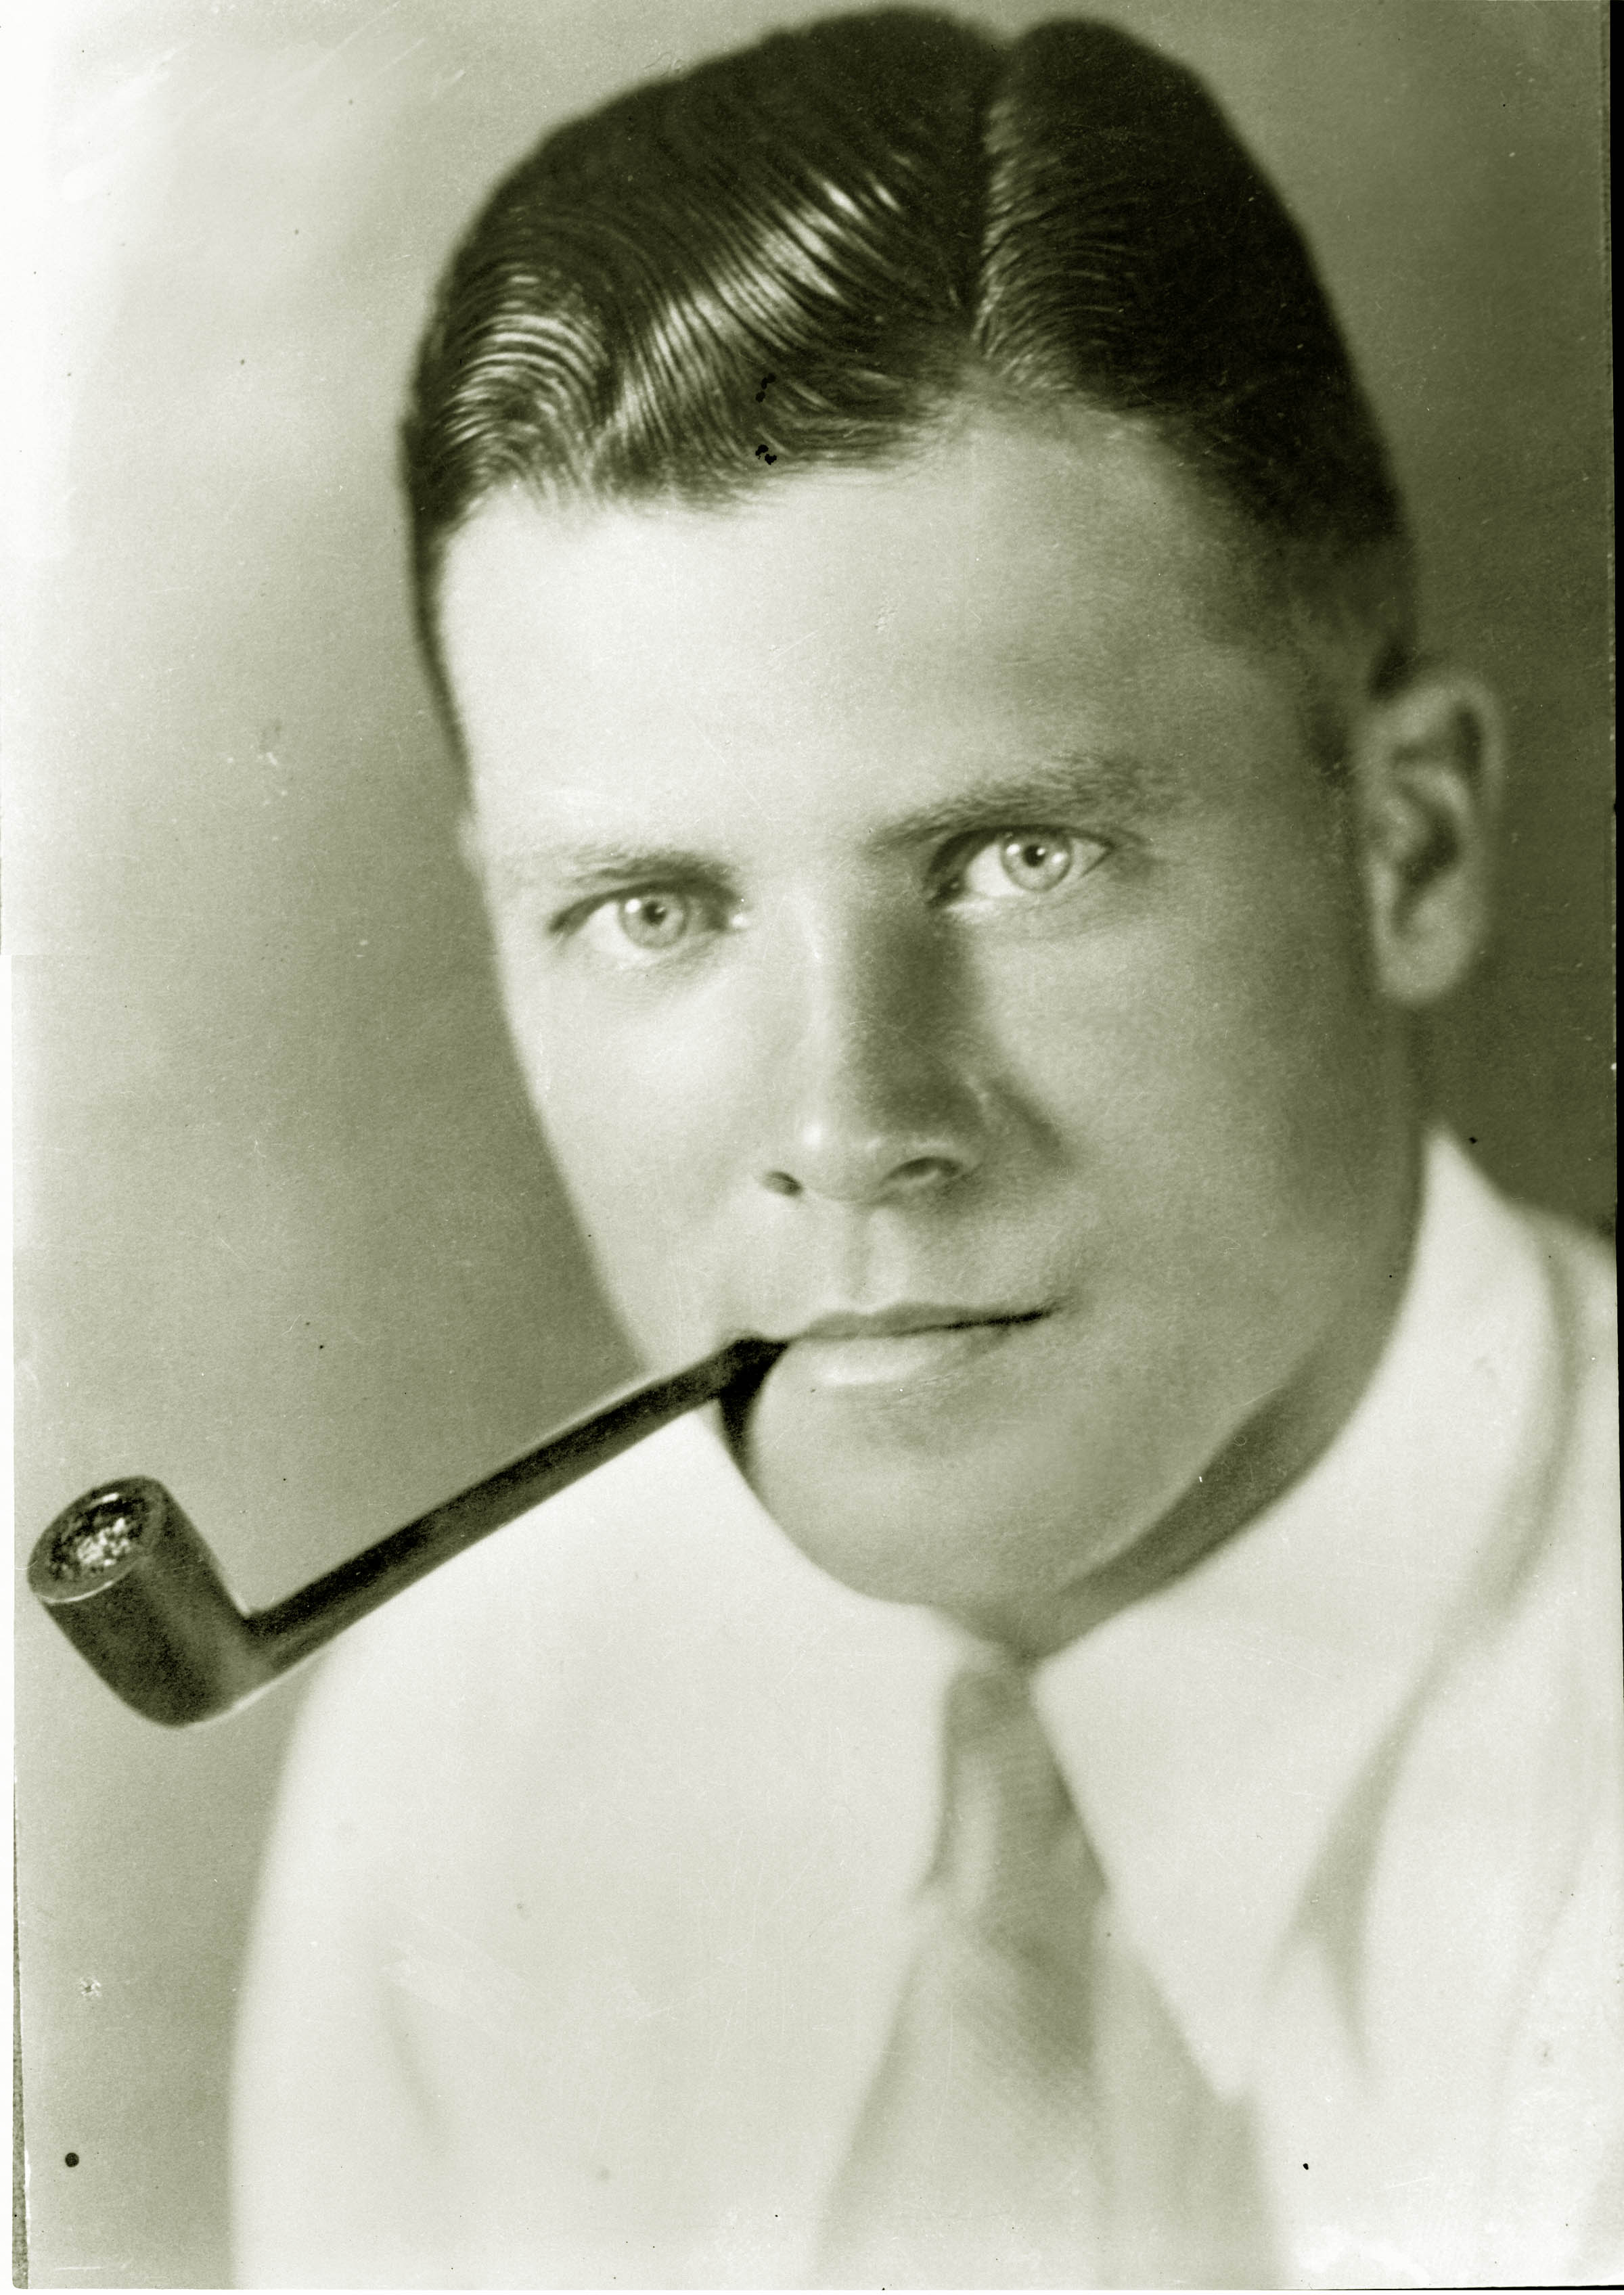 Wilbert H Smith